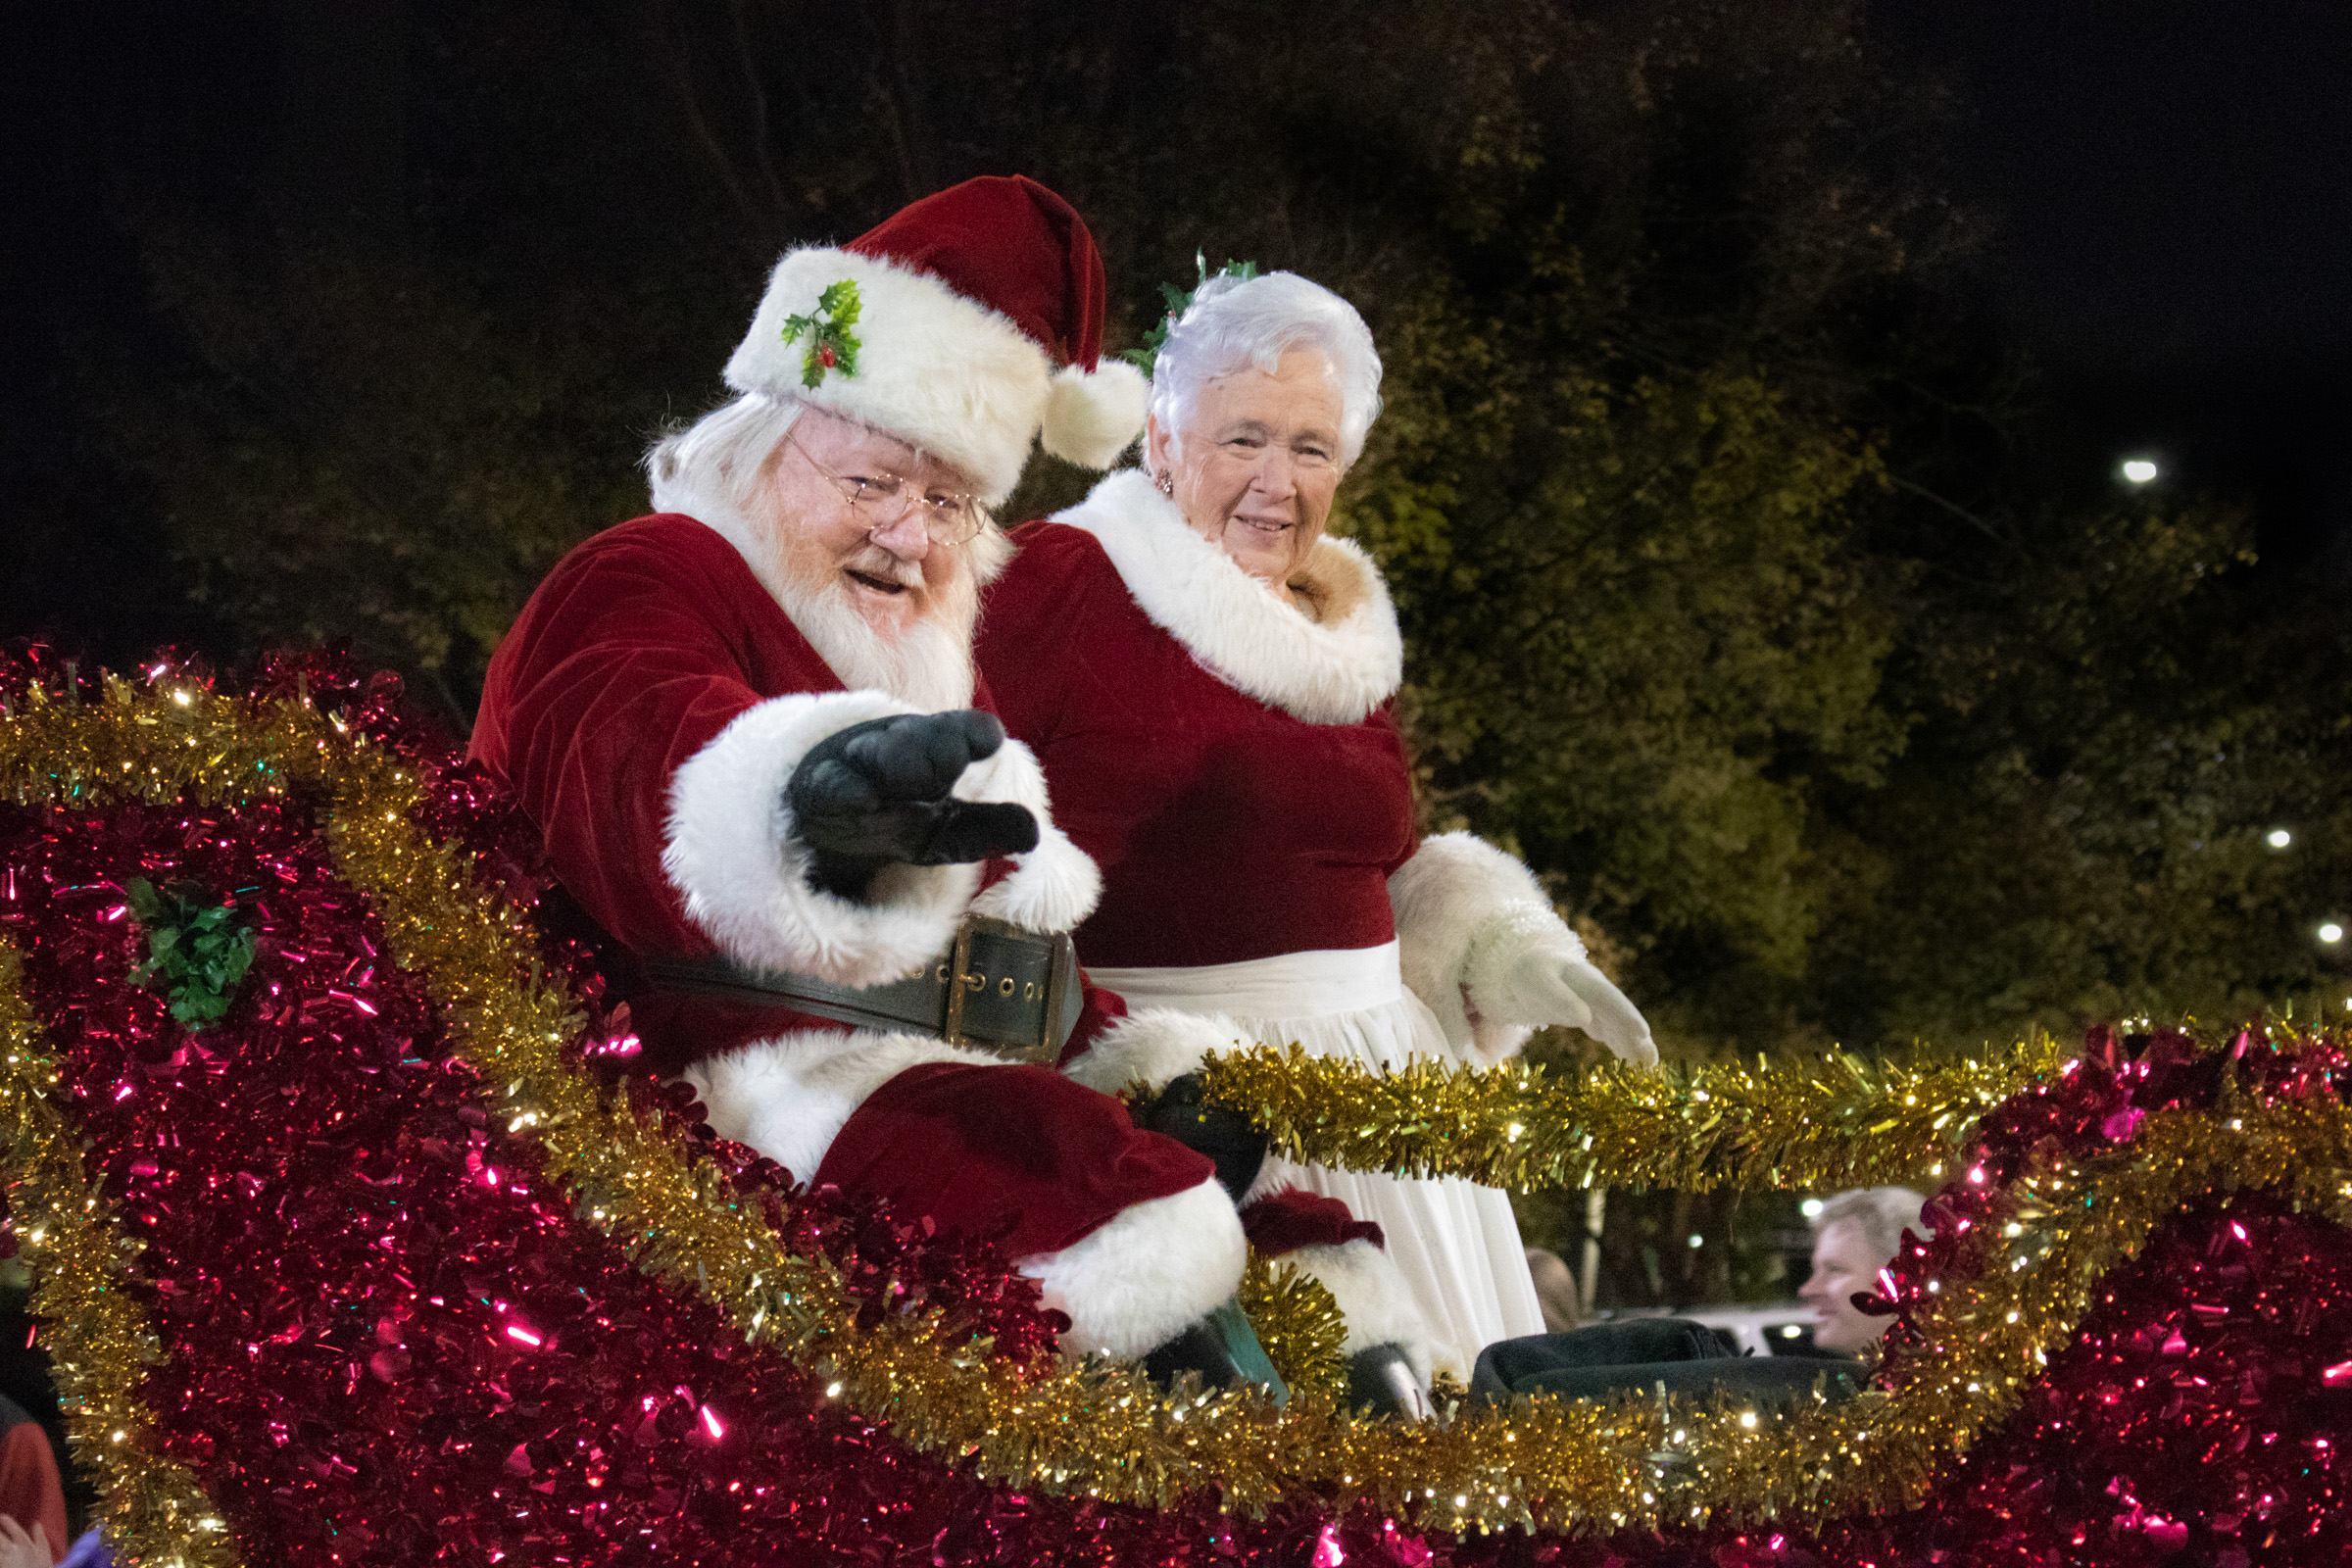 Newton Nc Christmas Parade 2020 Lowes Foods Christmas Parade and Tree Lighting | VisitNC.com